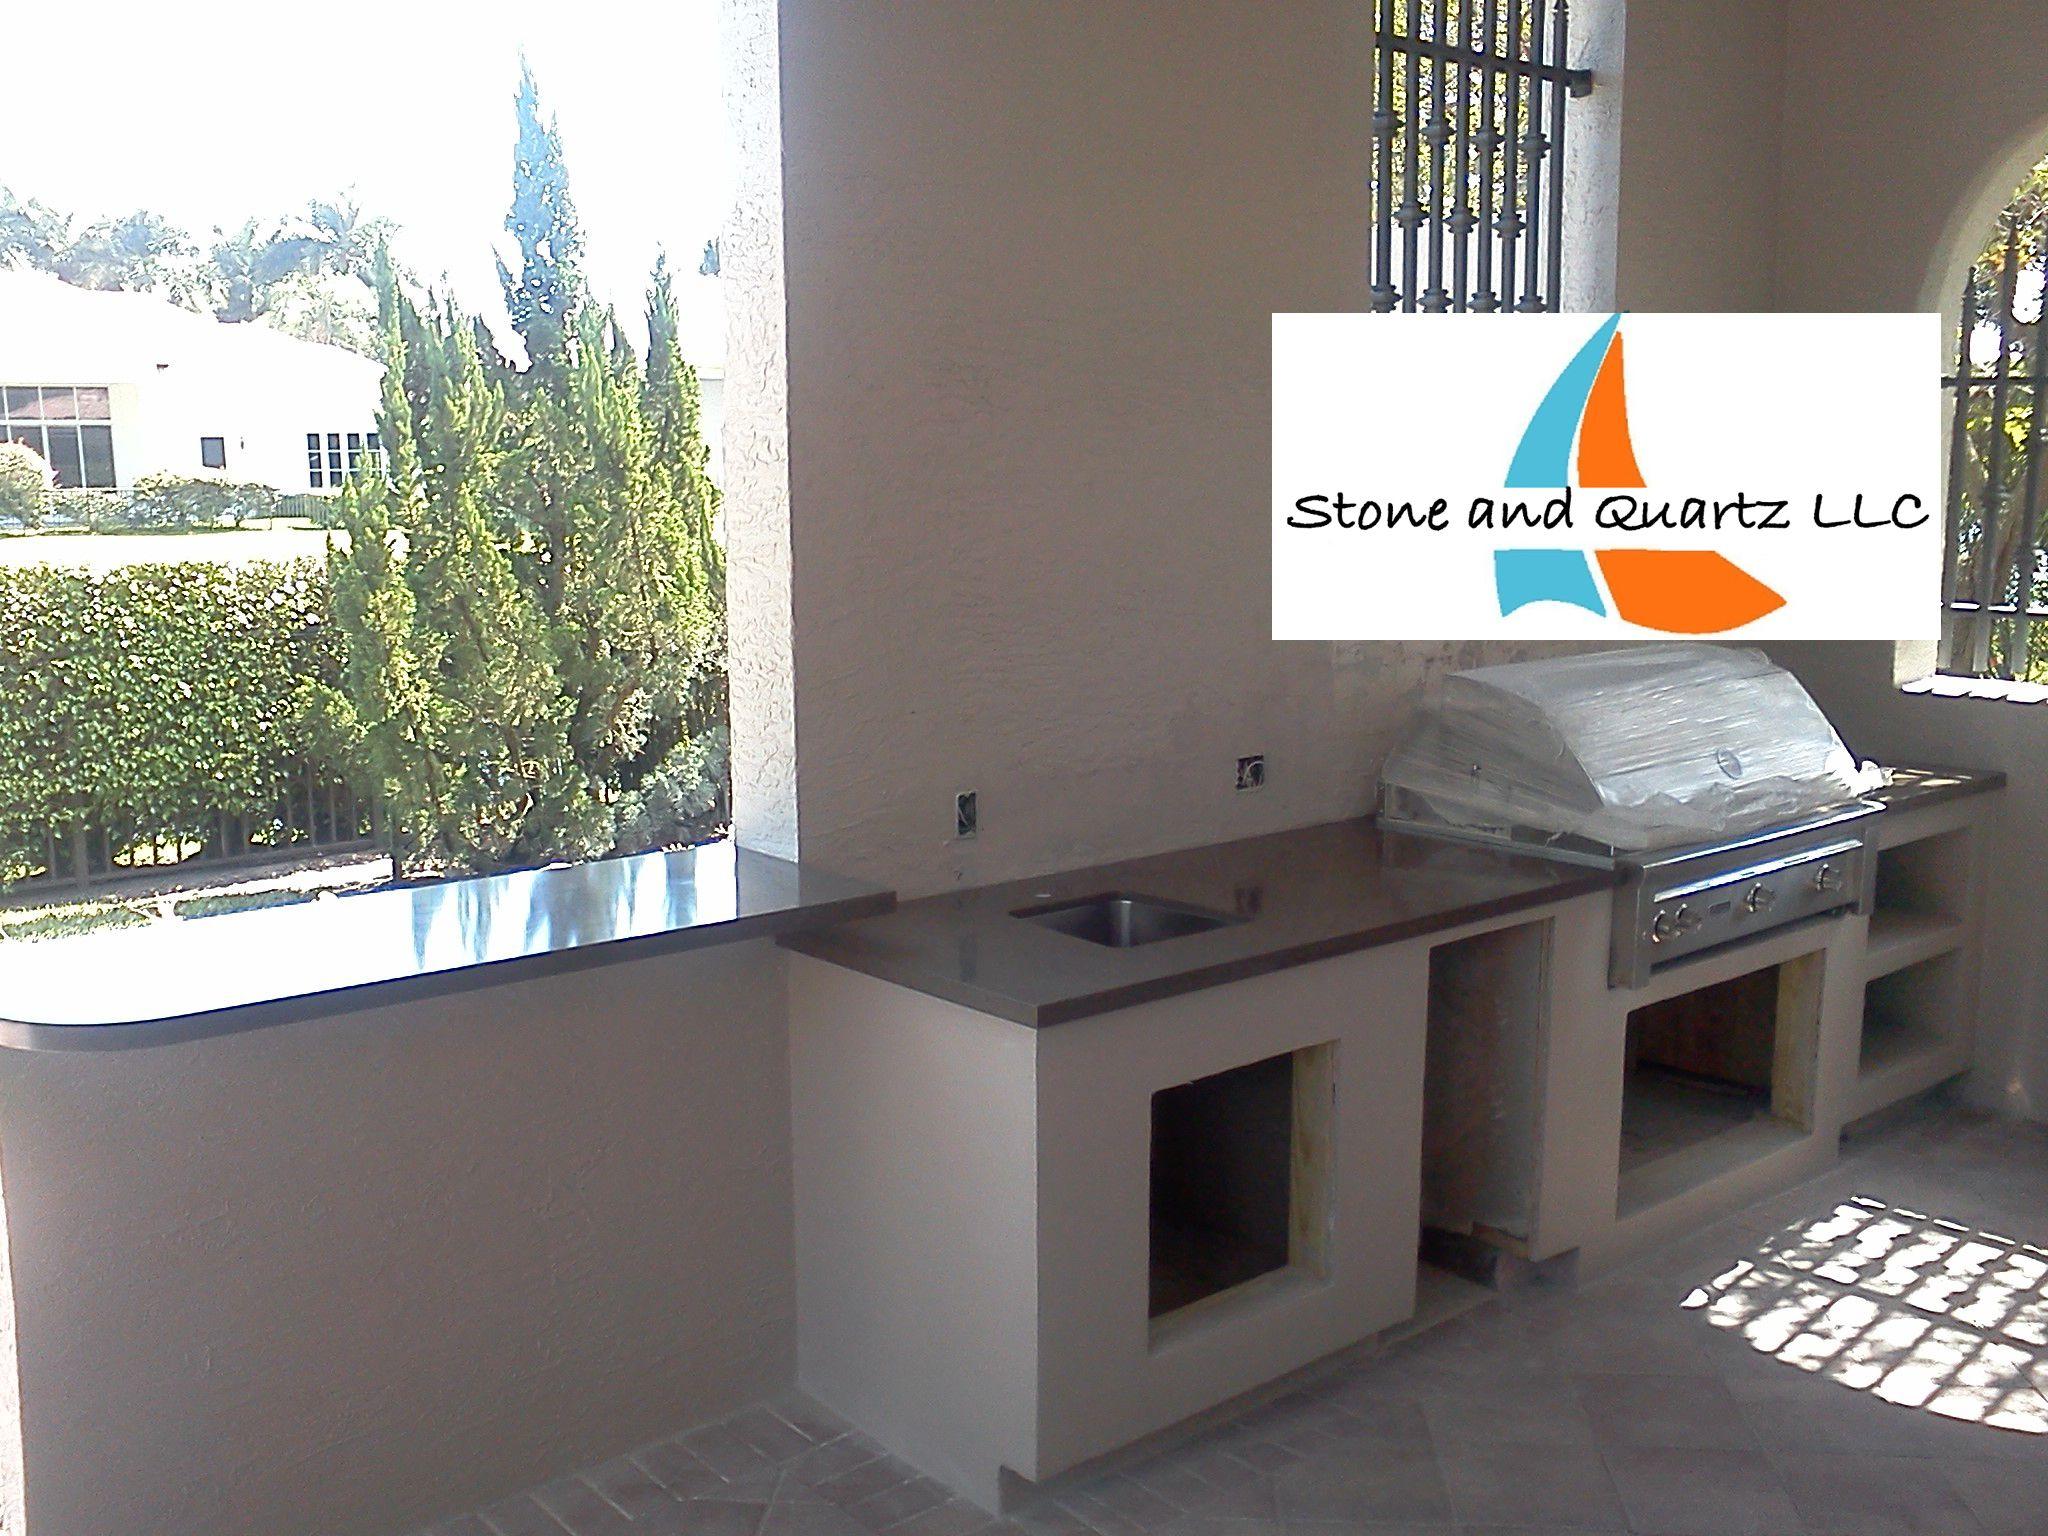 Outdoorküche Klein Quartz : Outdoor kitchen countertops fabricators stone and quartz llc